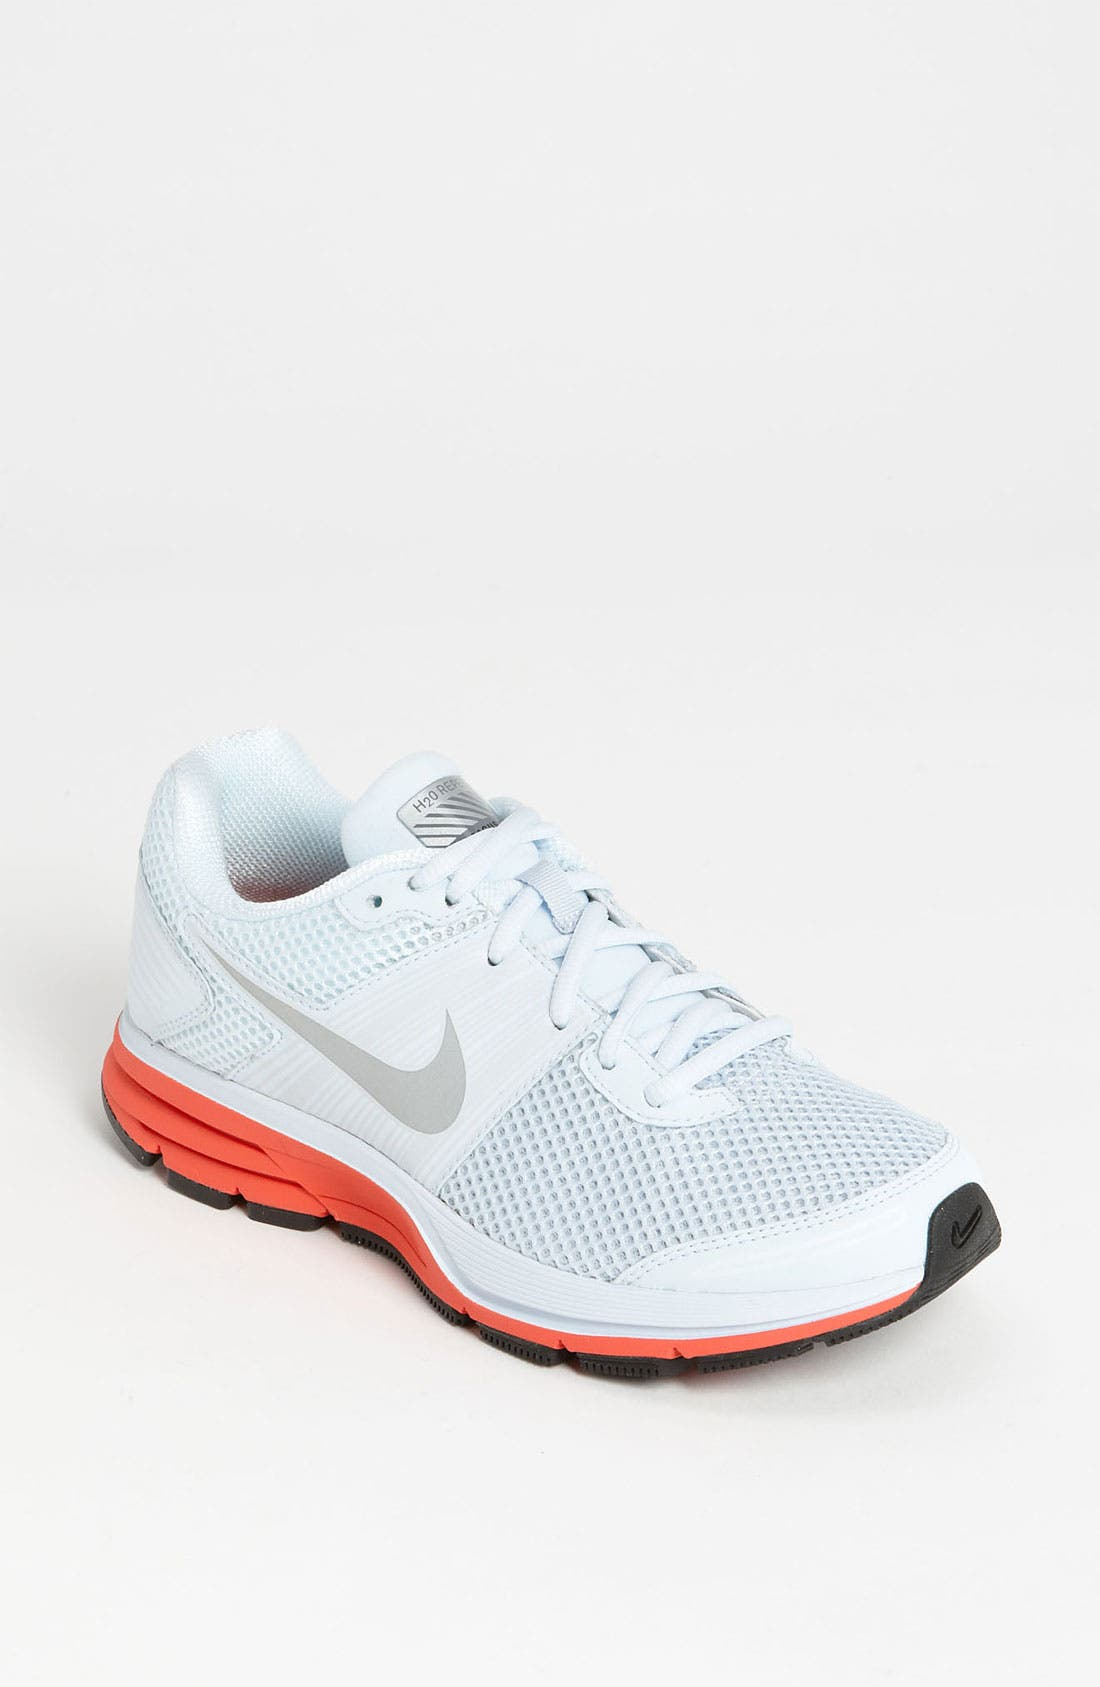 Main Image - Nike 'Air Pegasus+ 29 Shield' Running Shoe (Women)